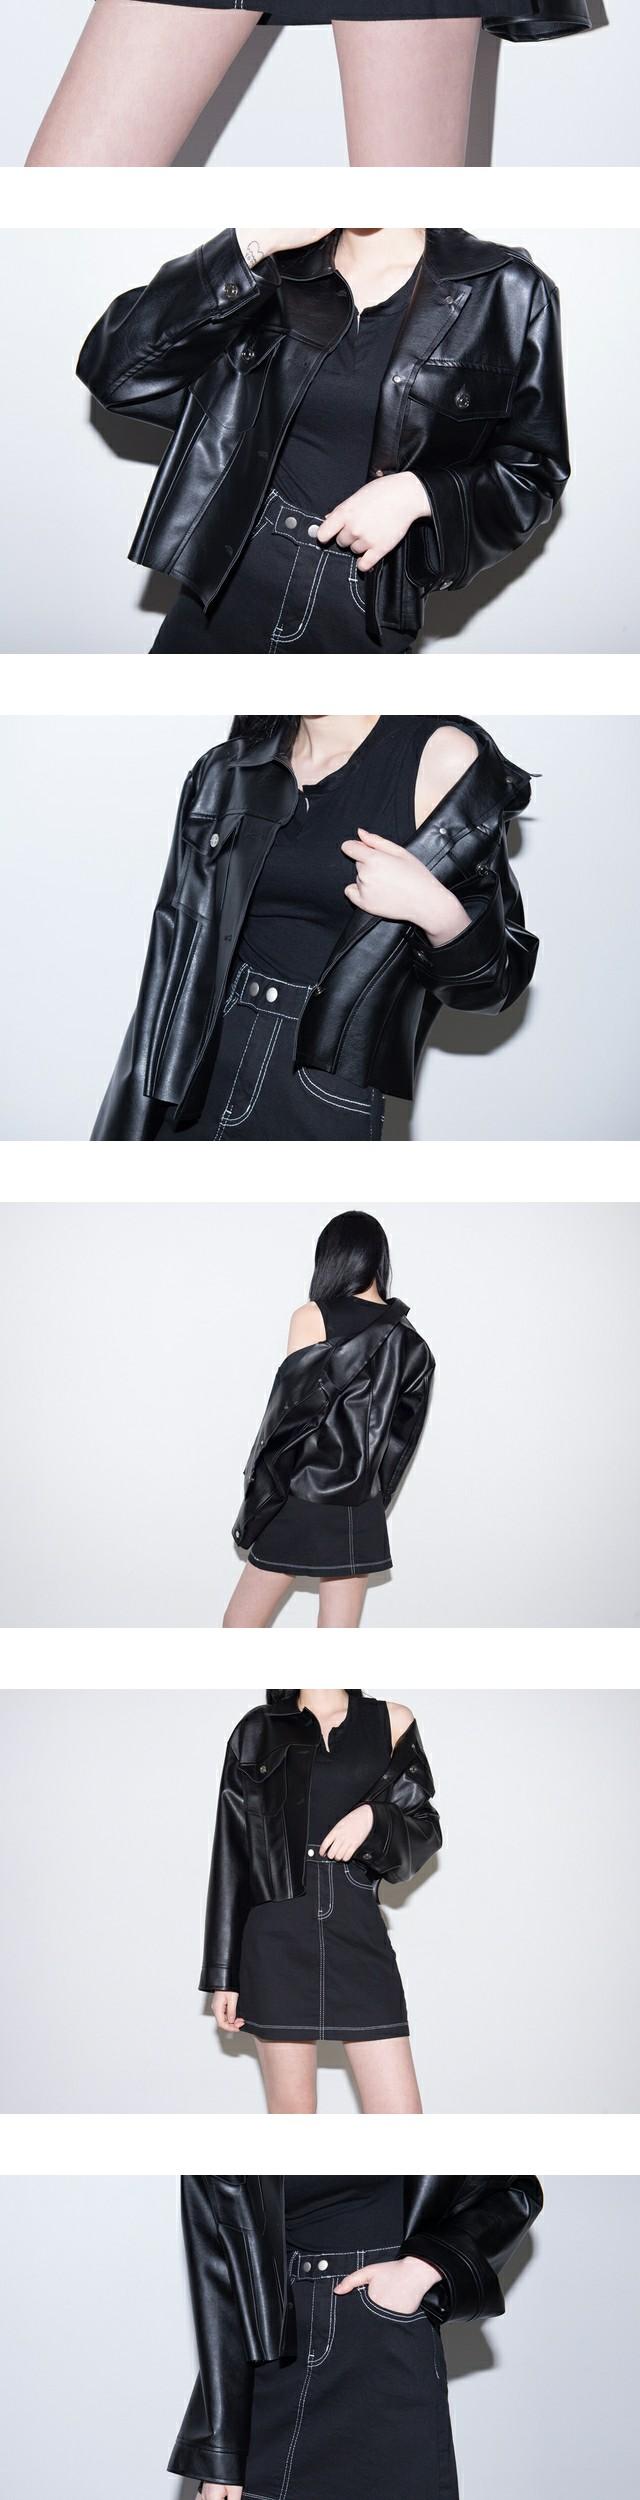 Acti Leather Jacket